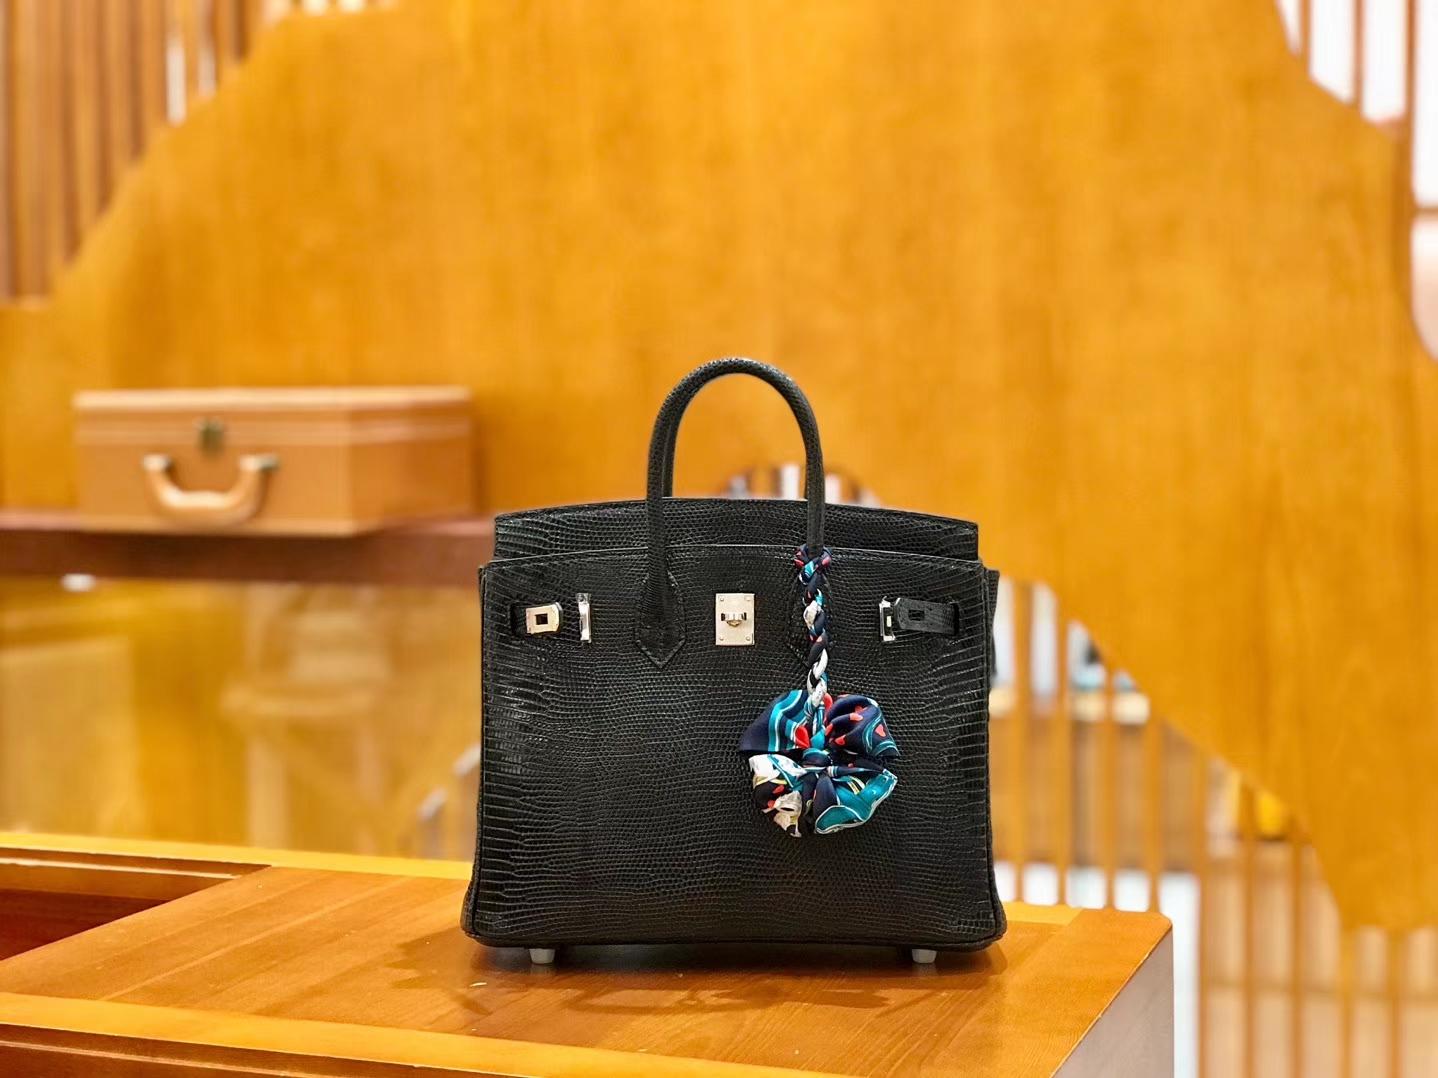 Hermès(爱马仕)Birkin 25cm 蜥蜴皮 经典黑 全手工缝制 现货